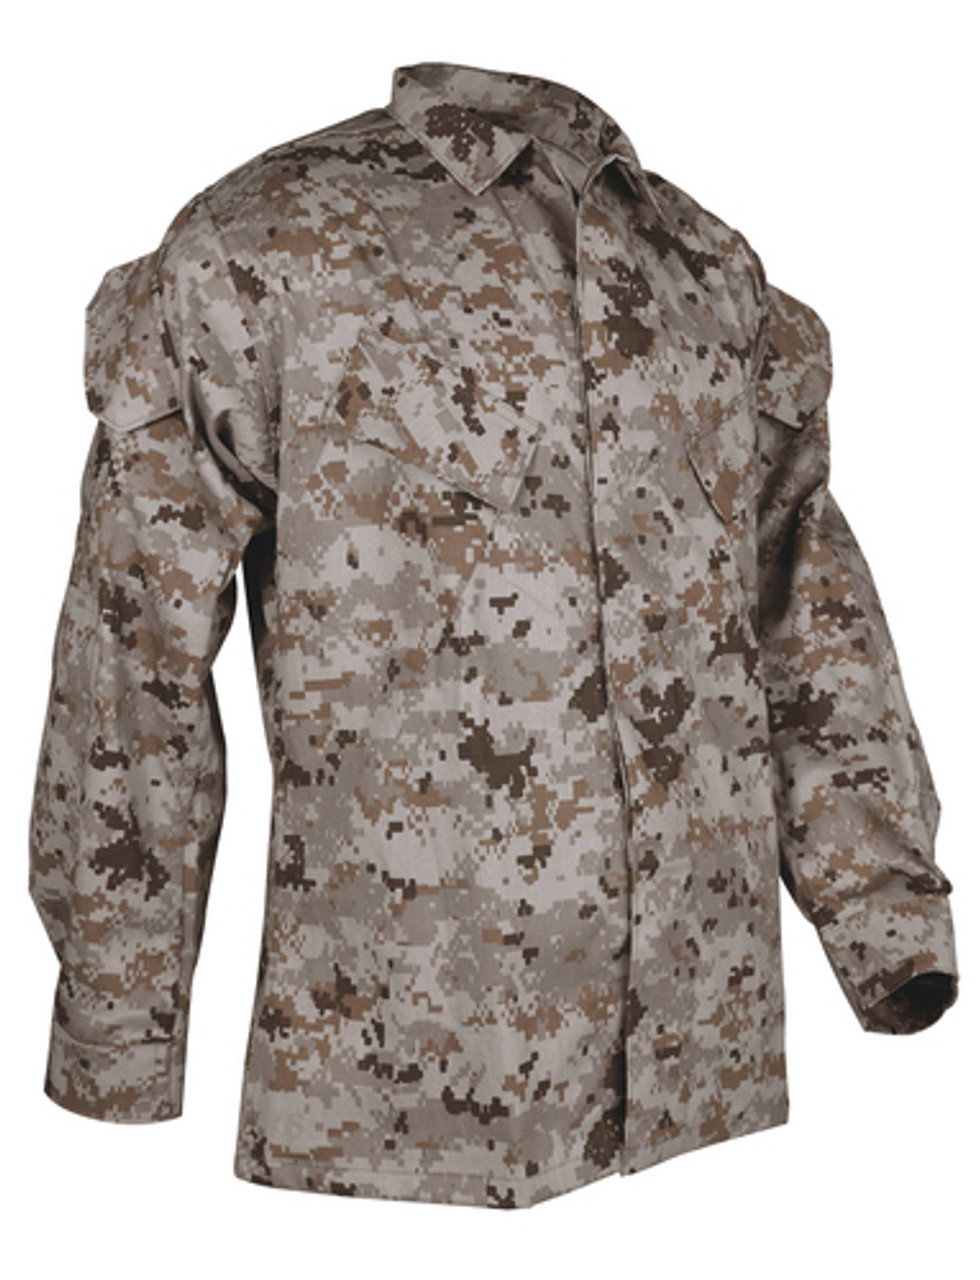 Tru-Spec TS-1929 VAT Print Digital Long Sleeve Uniform Shirt, 2 Chest Pockets, Elbow Pad Pockets, Sleeve Pocket, available in Desert Digital, Urban Digital, or Woodland Digital